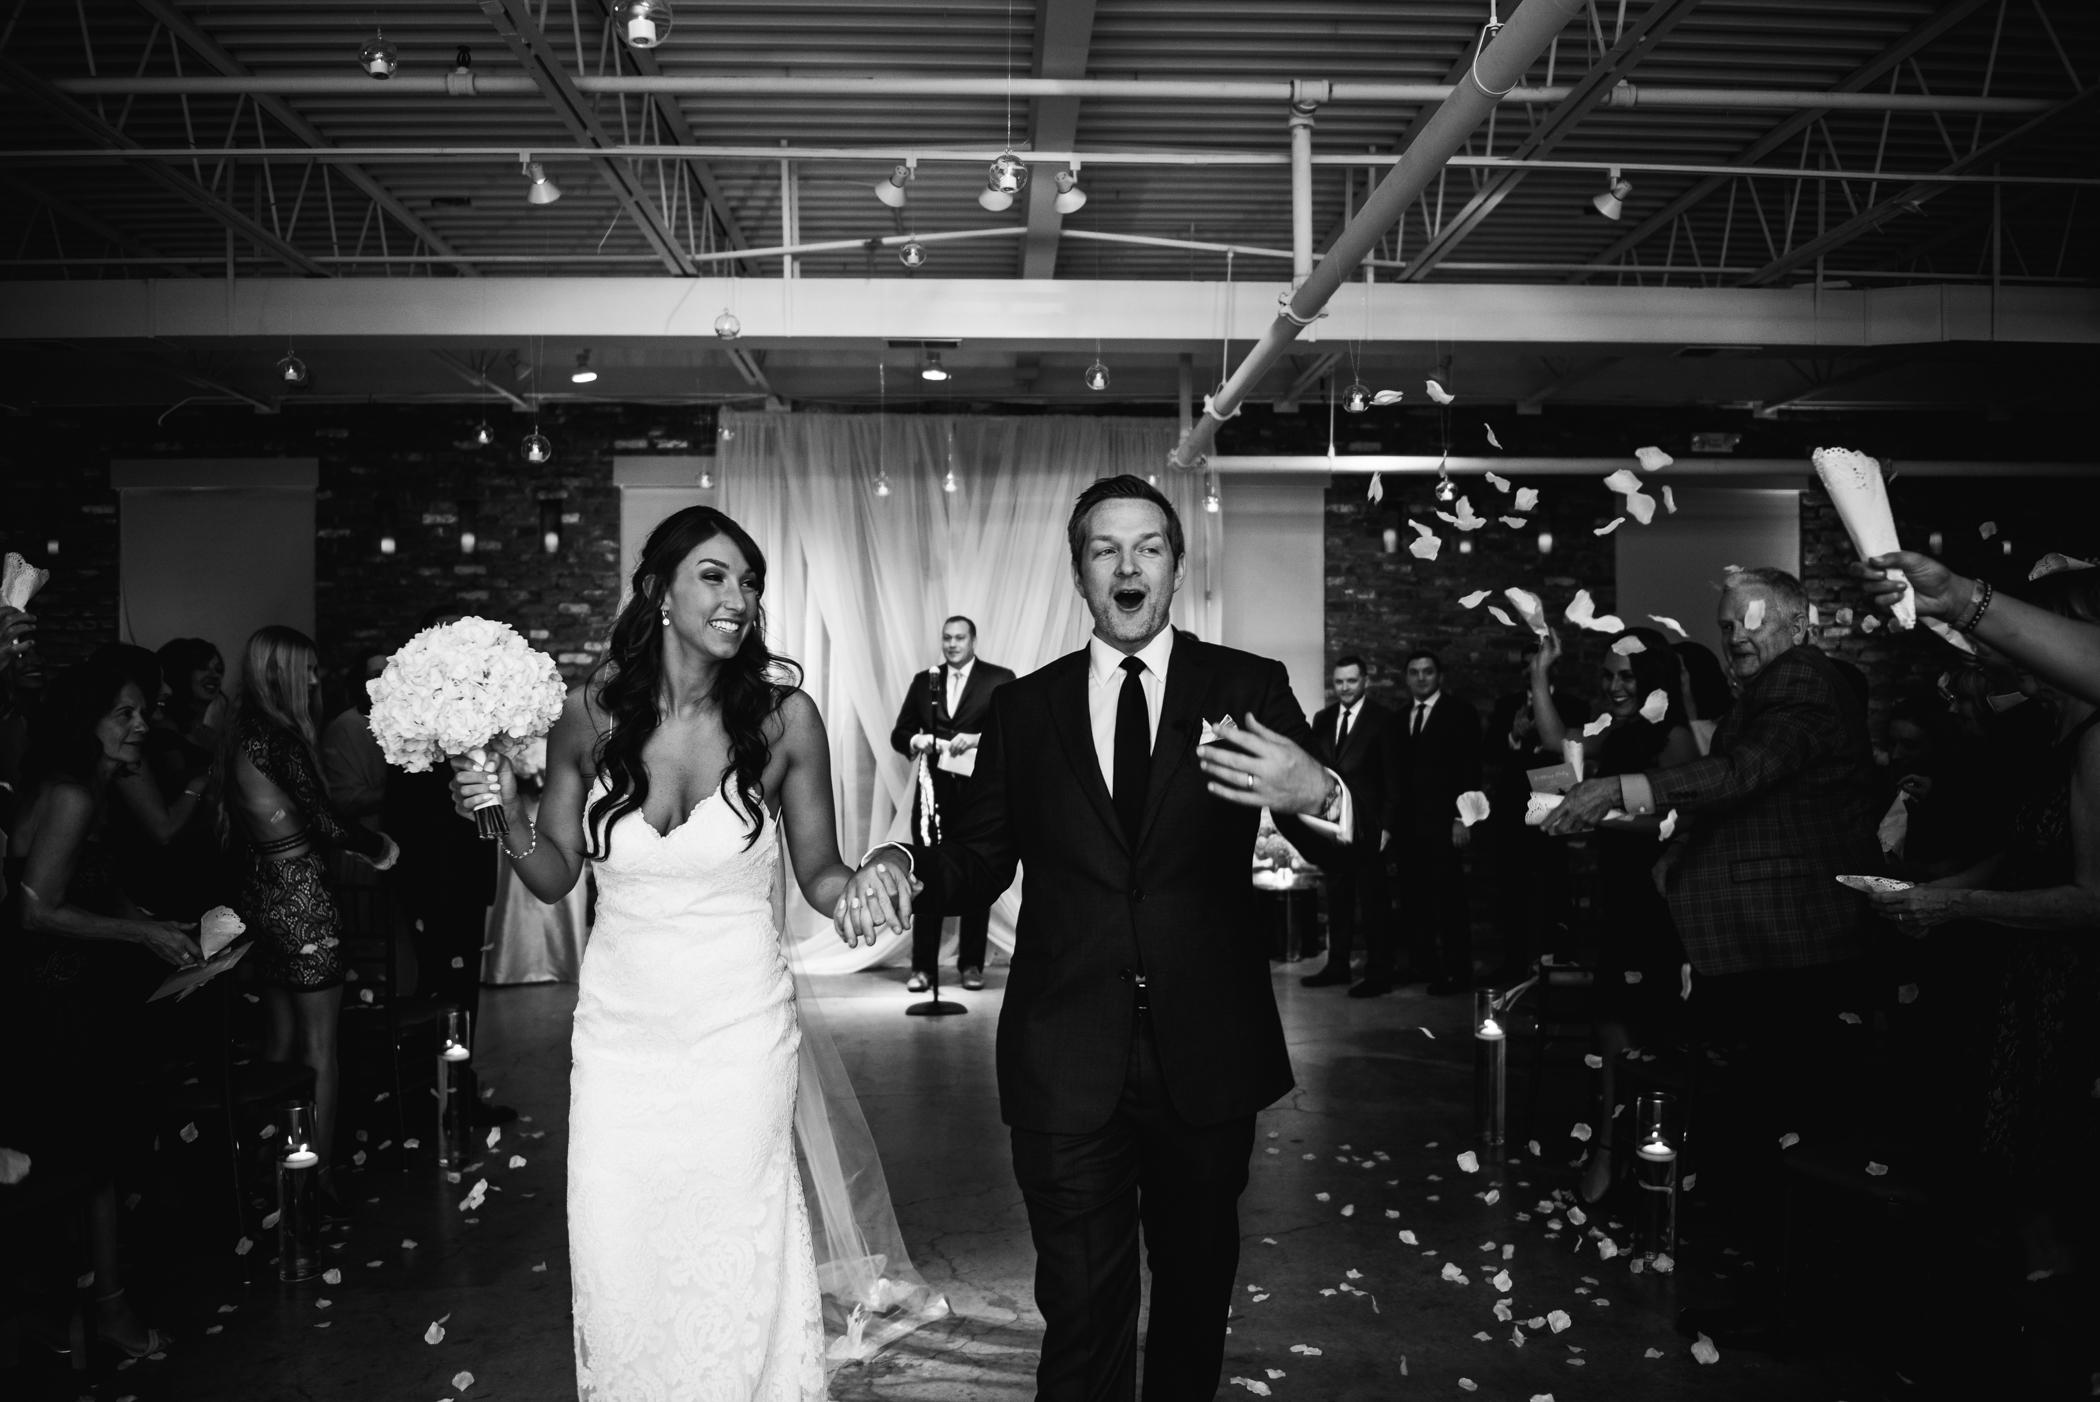 connecticut-wedding-photographers-chris-nachtwey-photography-2018-13.jpg